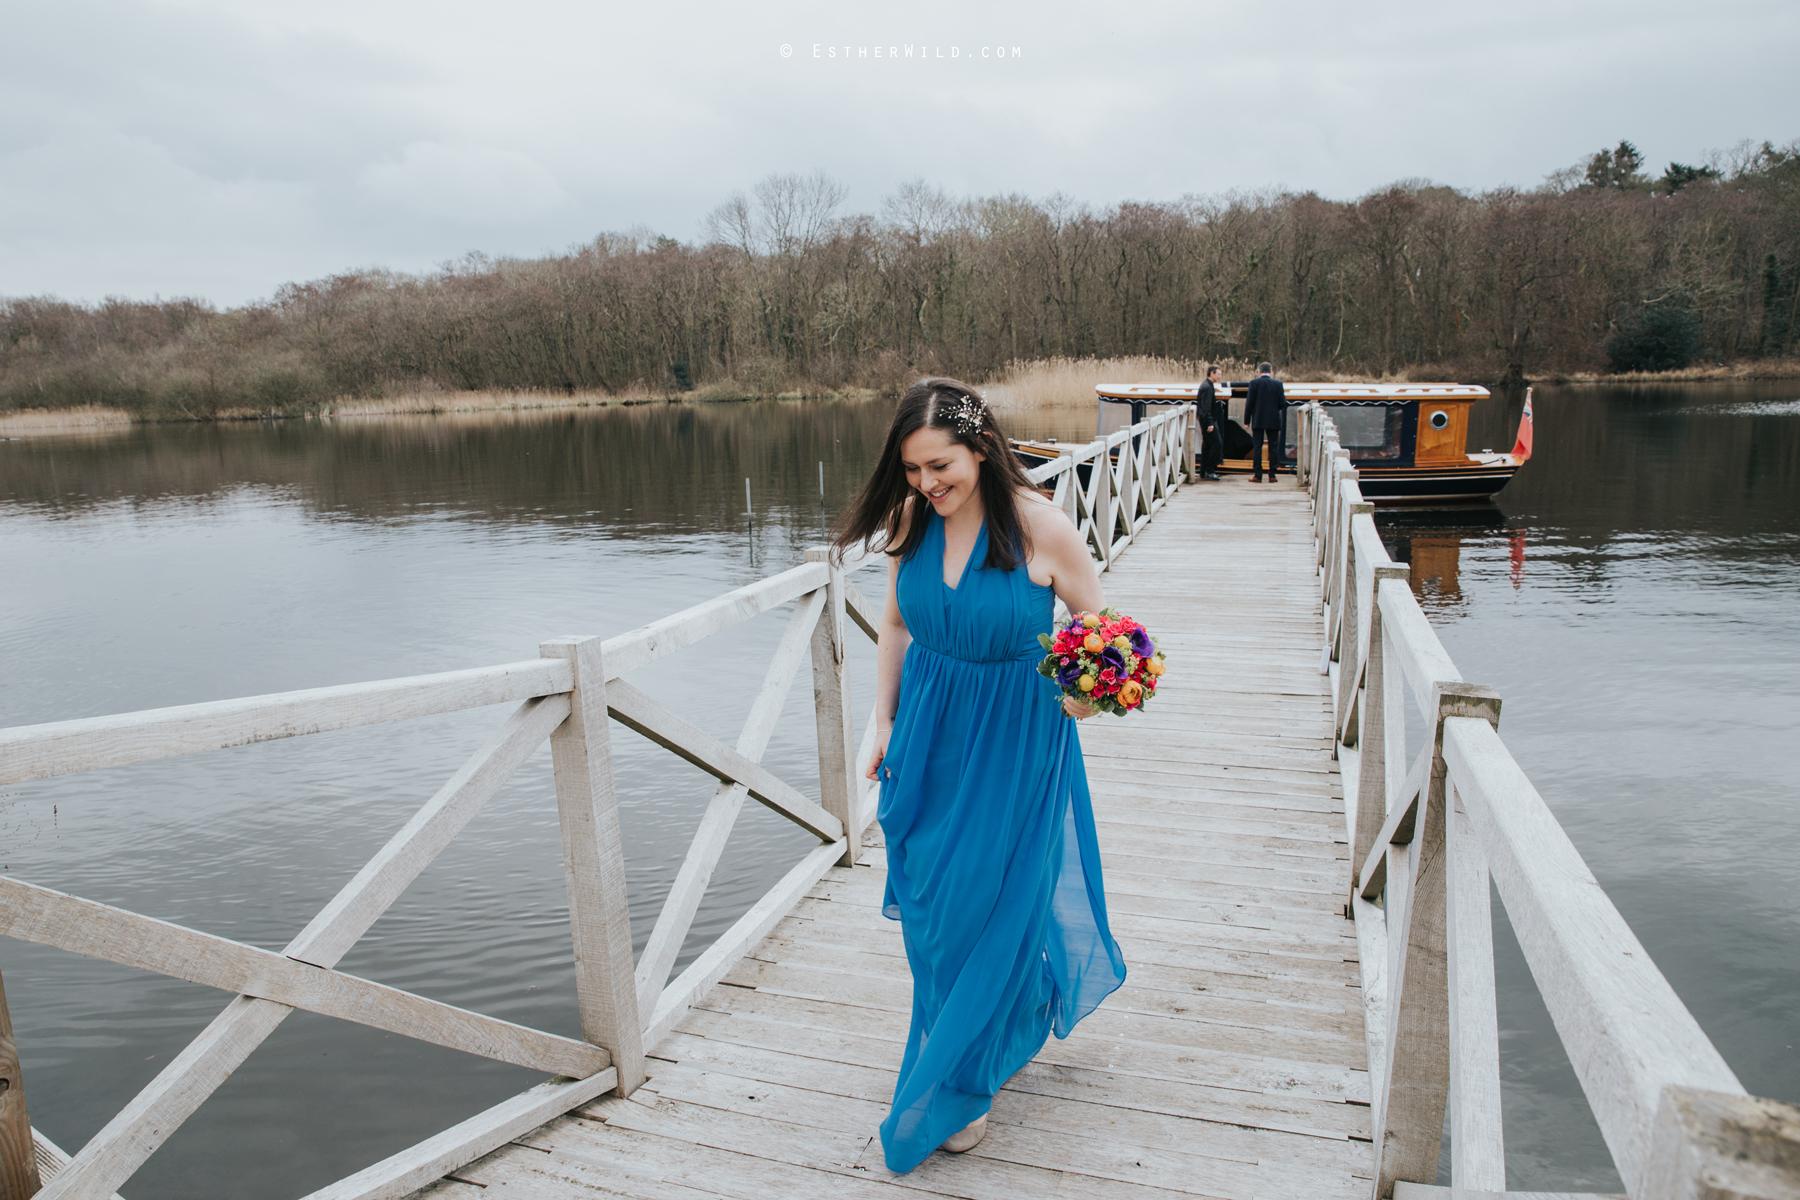 The_BoatHouse_Wedding_Venue_Ormesby_Norfolk_Broads_Boat_Wedding_Photography_Esther_Wild_Photographer_IMG_0945.jpg